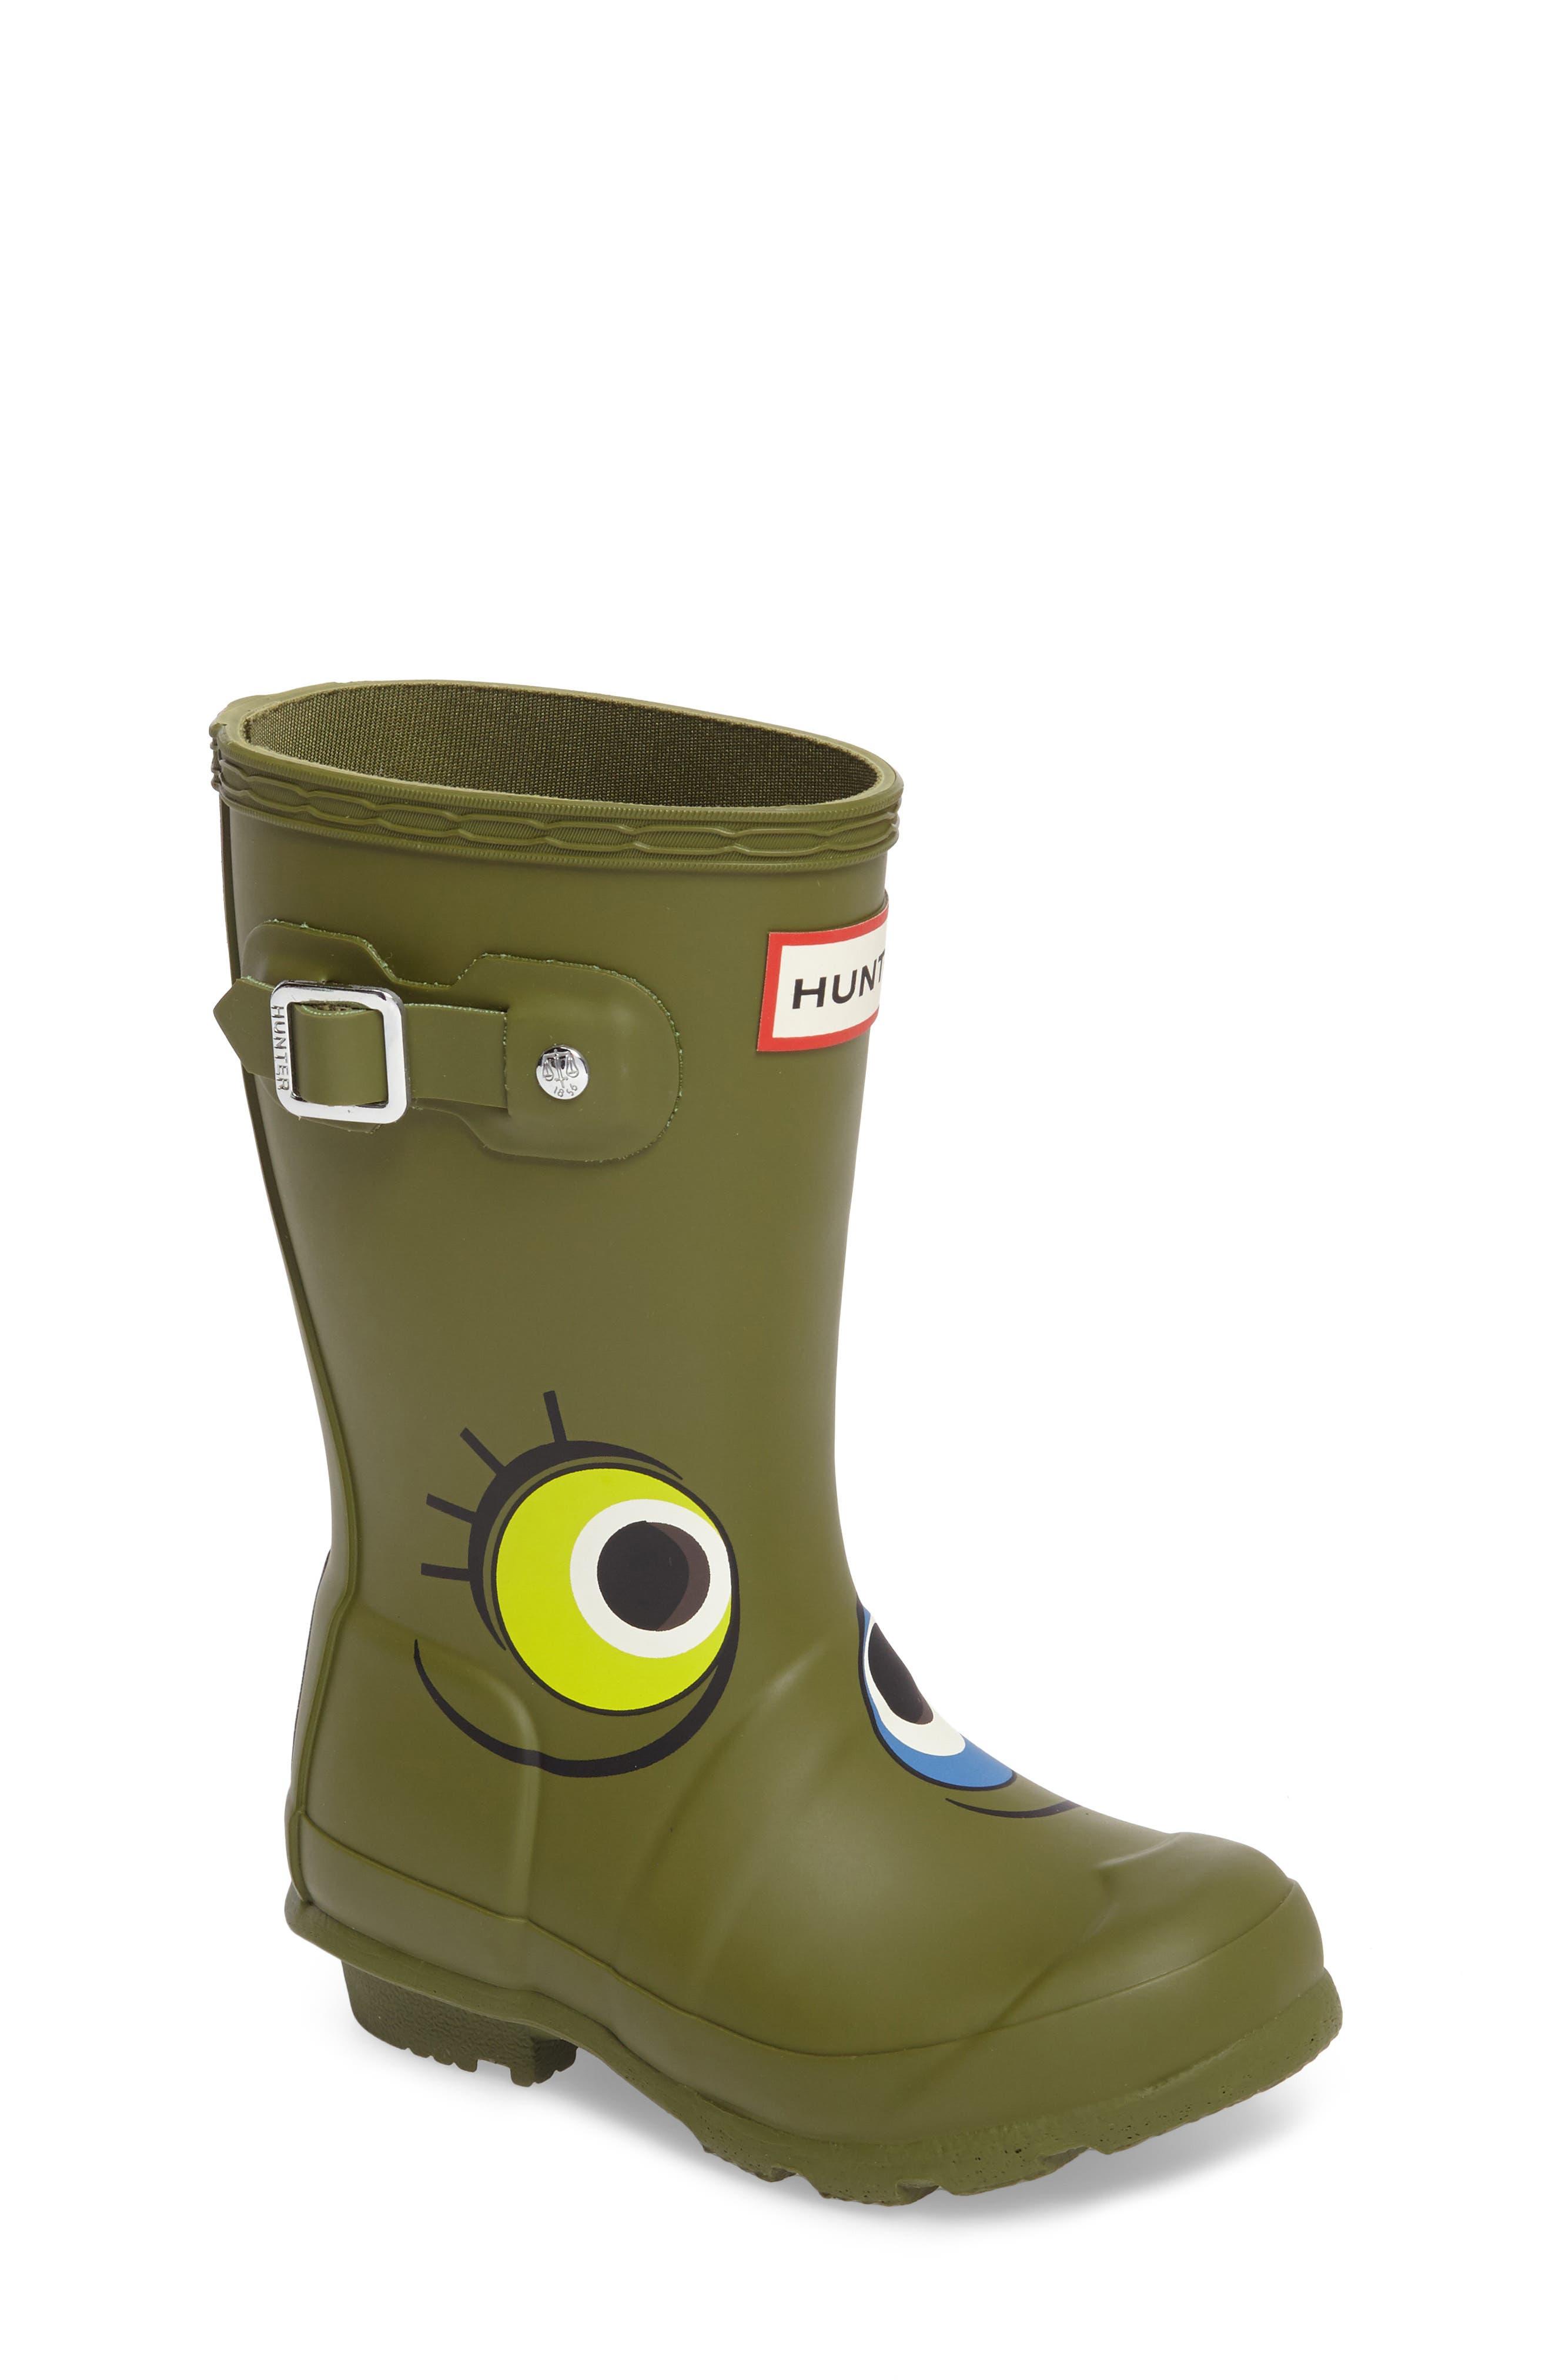 Alien Waterproof Rain Boot,                             Main thumbnail 1, color,                             309